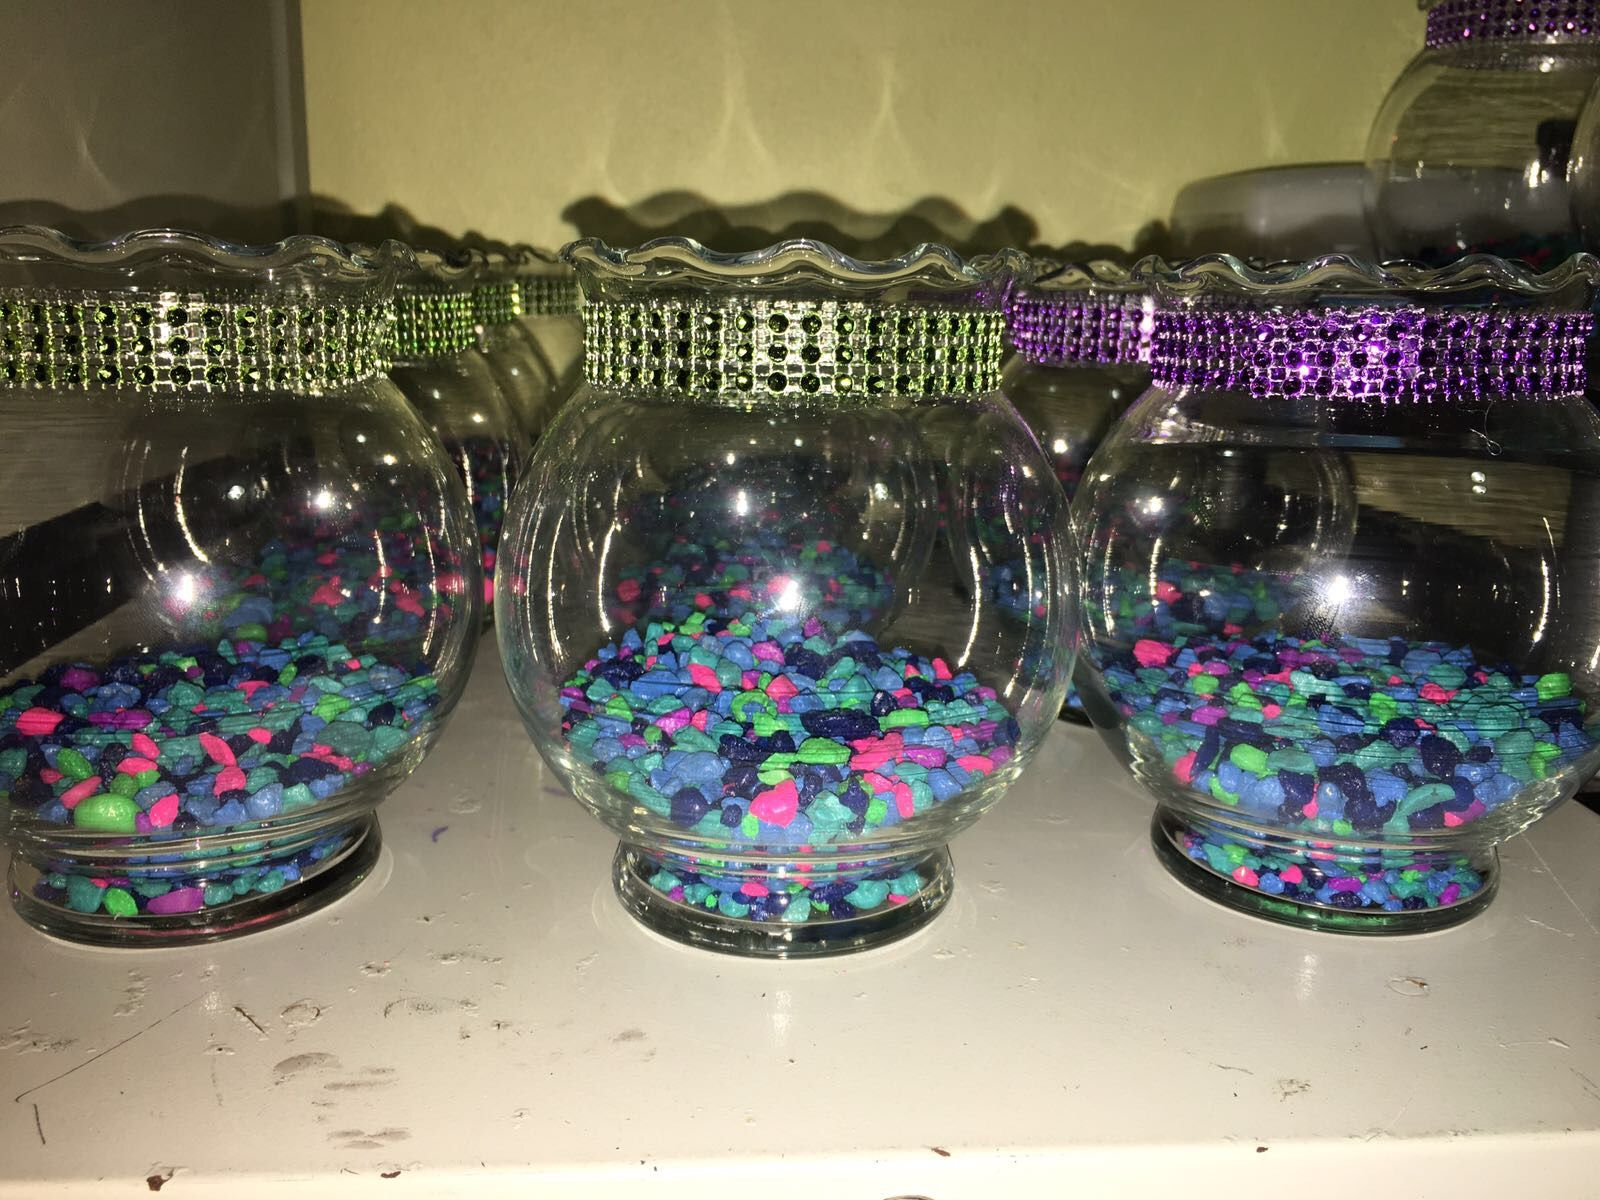 Peceras centro de mesa decoracion sirena little mermaid - Peceras pequenas decoradas ...